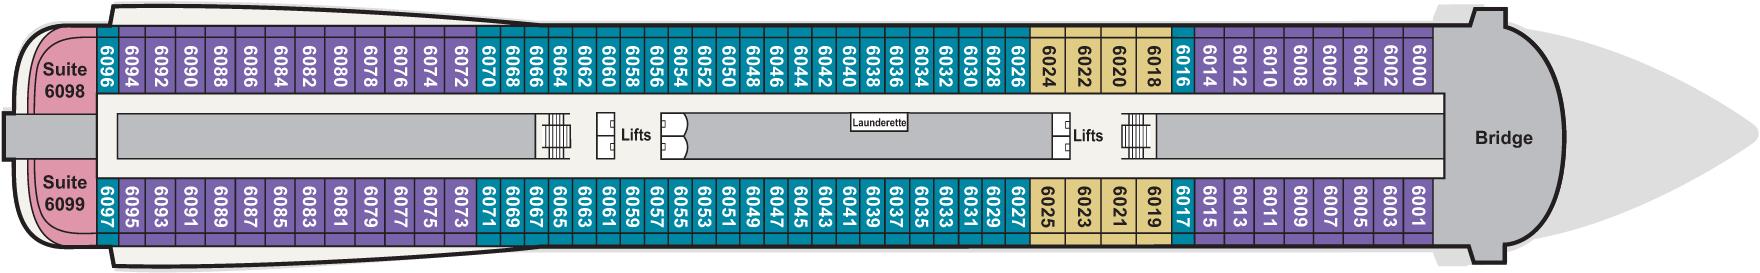 Viking Ocean Cruises Viking Star Deck Plans Deck 6.jpeg